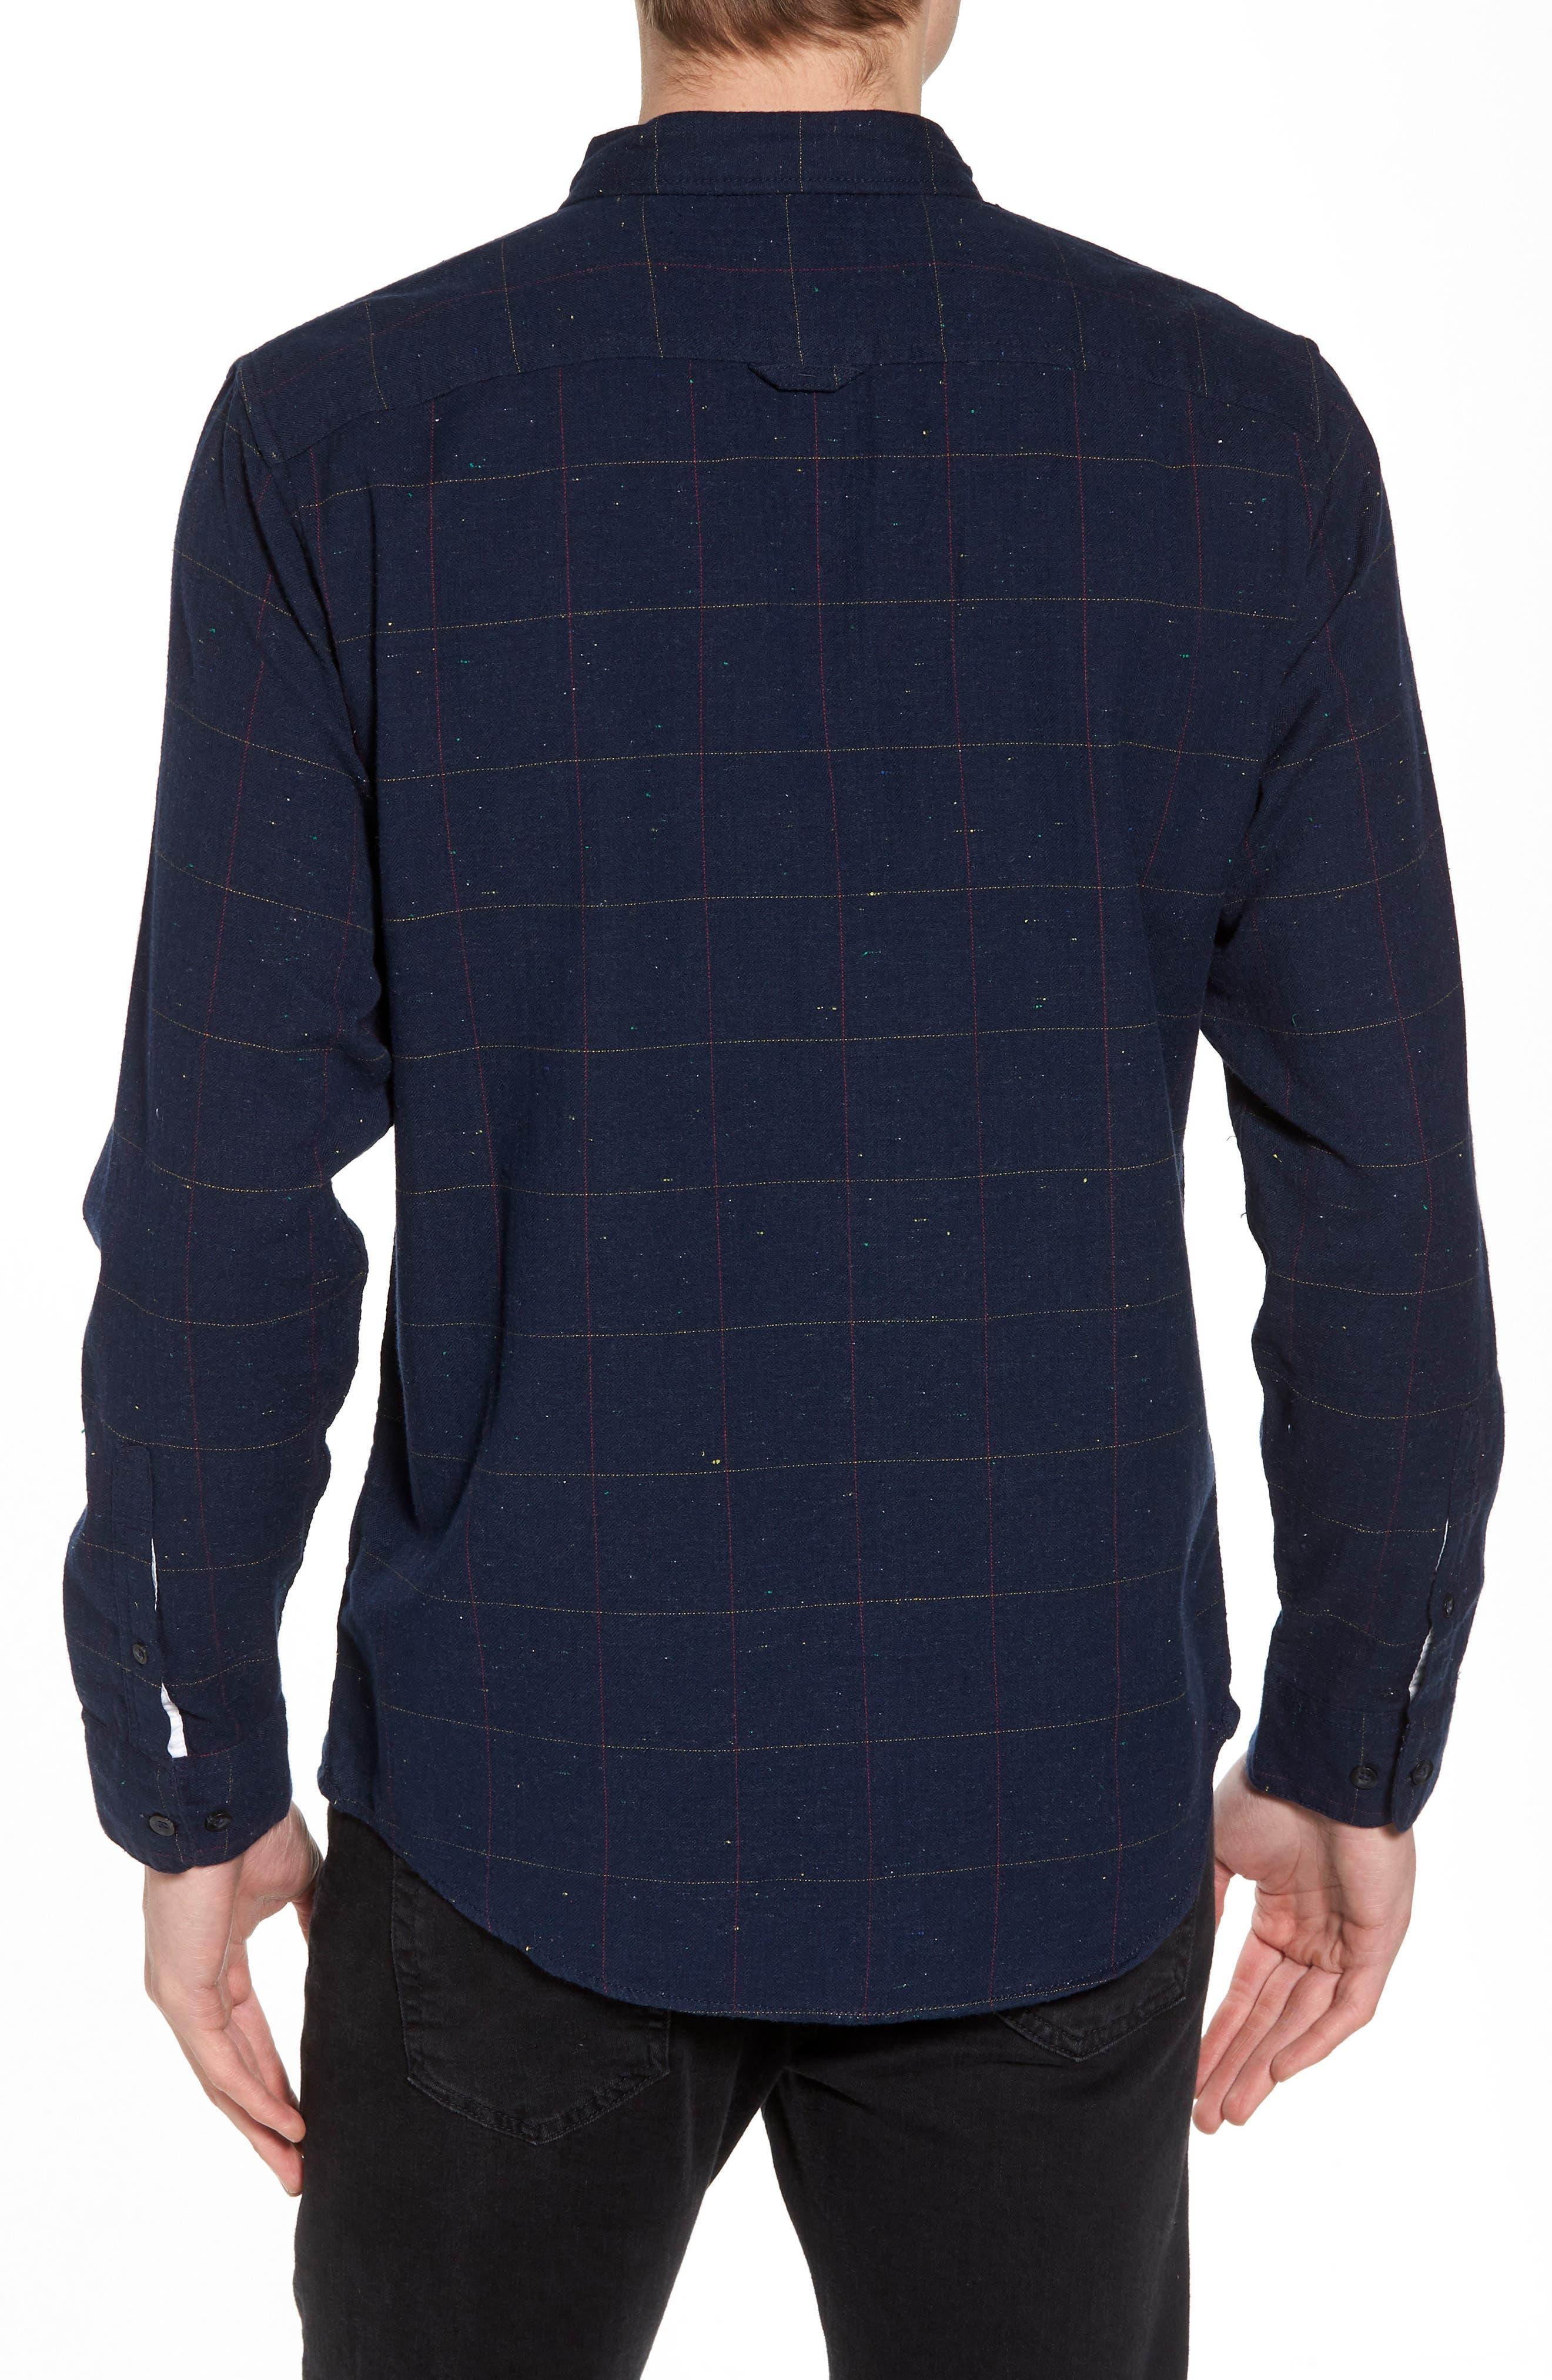 Herringbone Plaid Flannel Shirt,                             Alternate thumbnail 2, color,                             Black - White Nepped Tartan